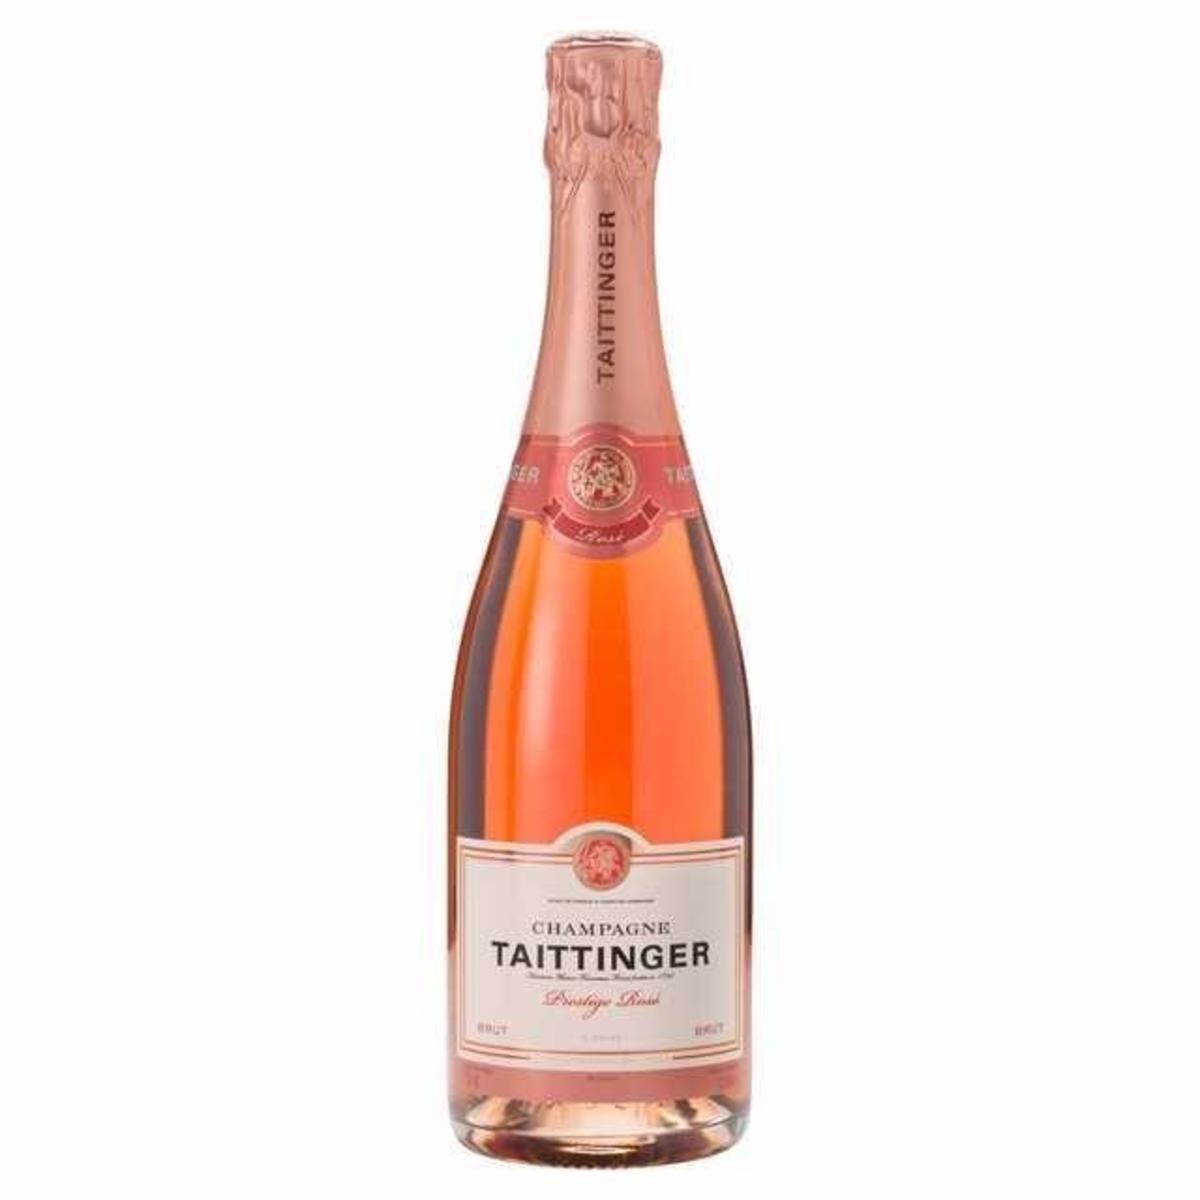 Champagne Taittinger Prestinge Rosé 750ml